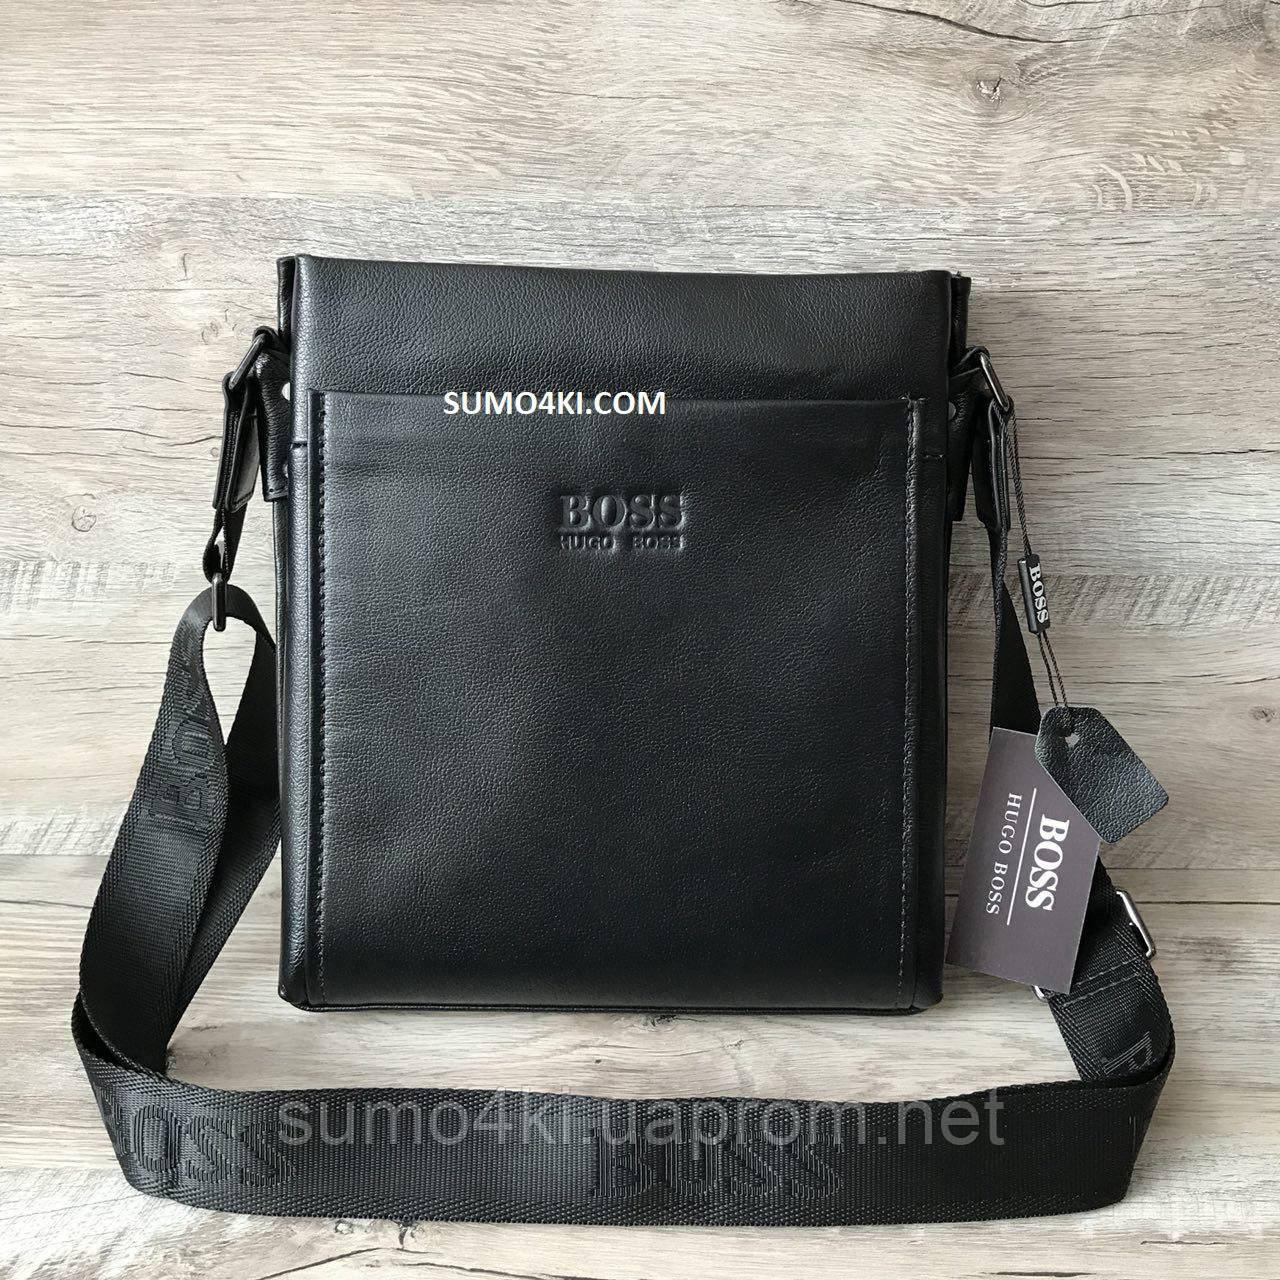 d138a6f4a71b Мужская кожаная сумка Hugo Boss - Интернет-магазин «Галерея Сумок» в Одессе